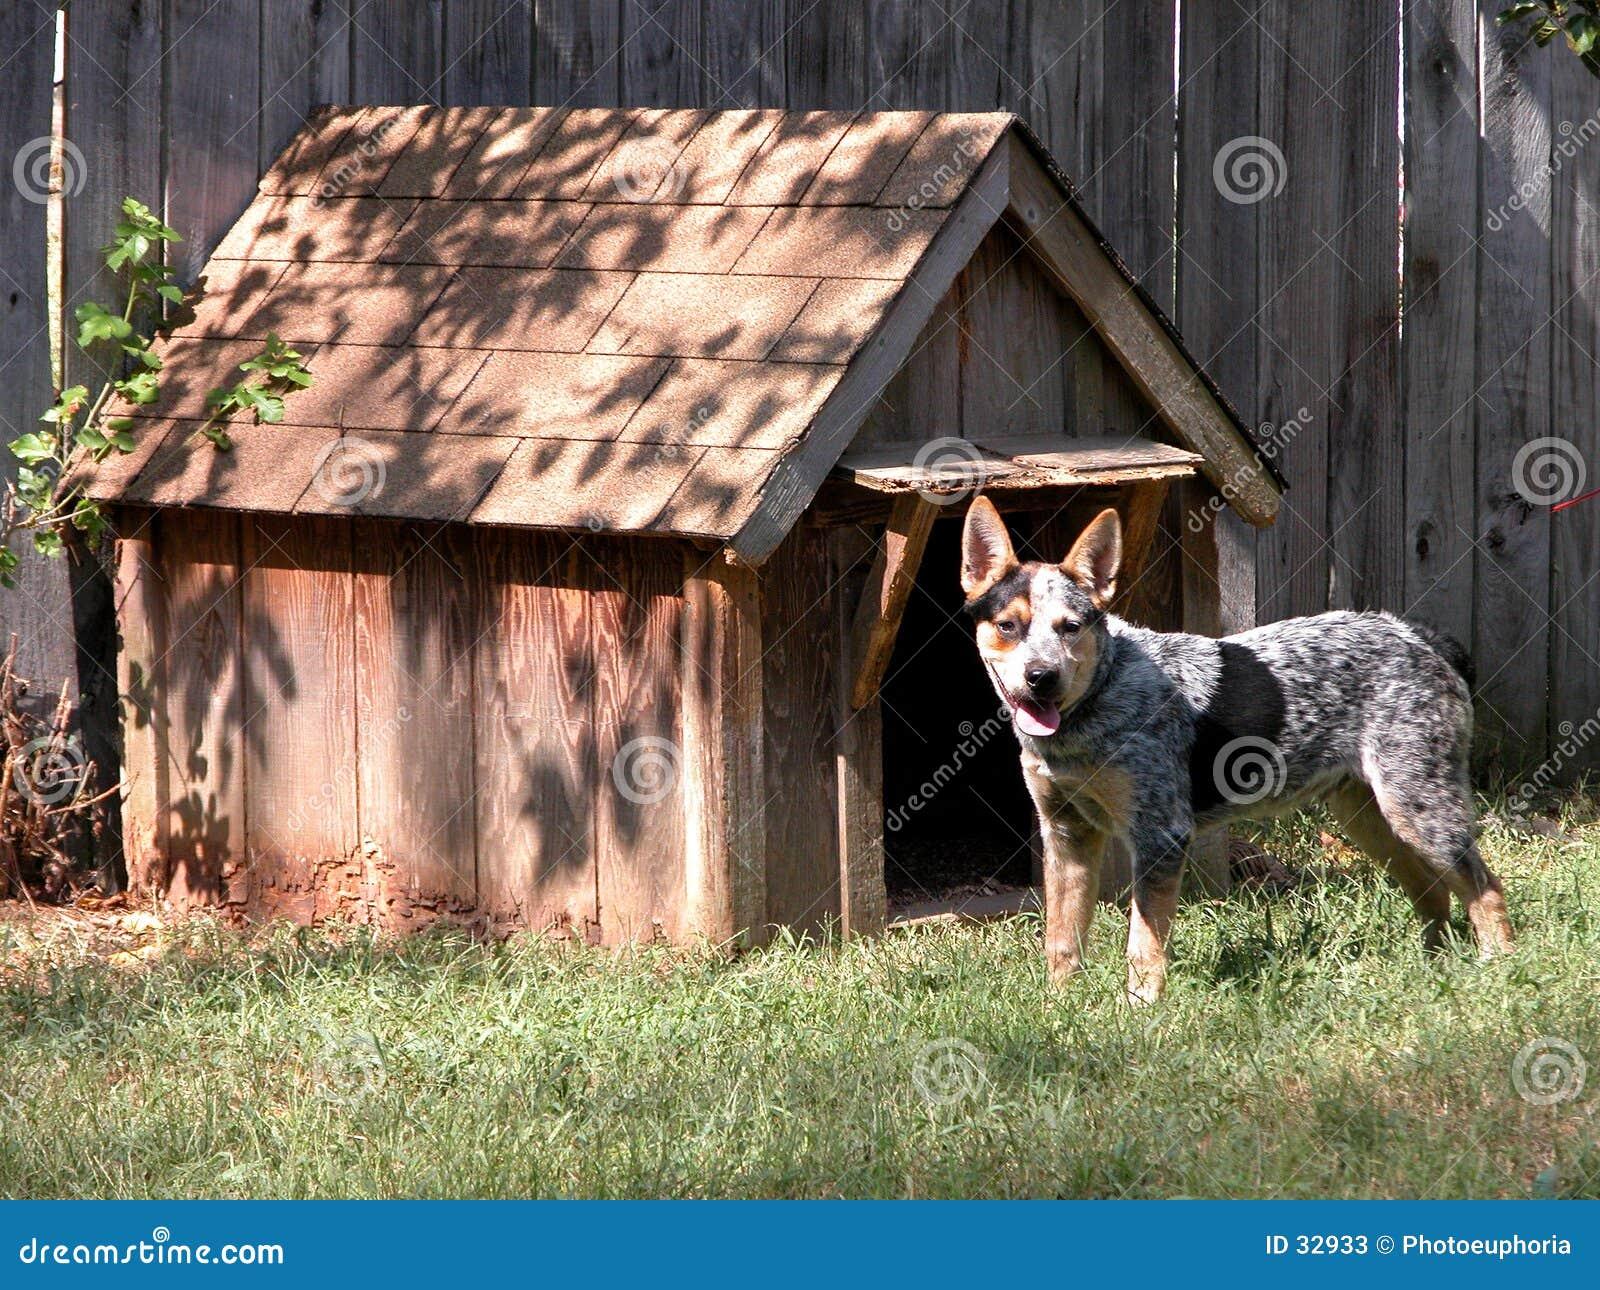 Blaues Heeler außerhalb seines Hundehauses